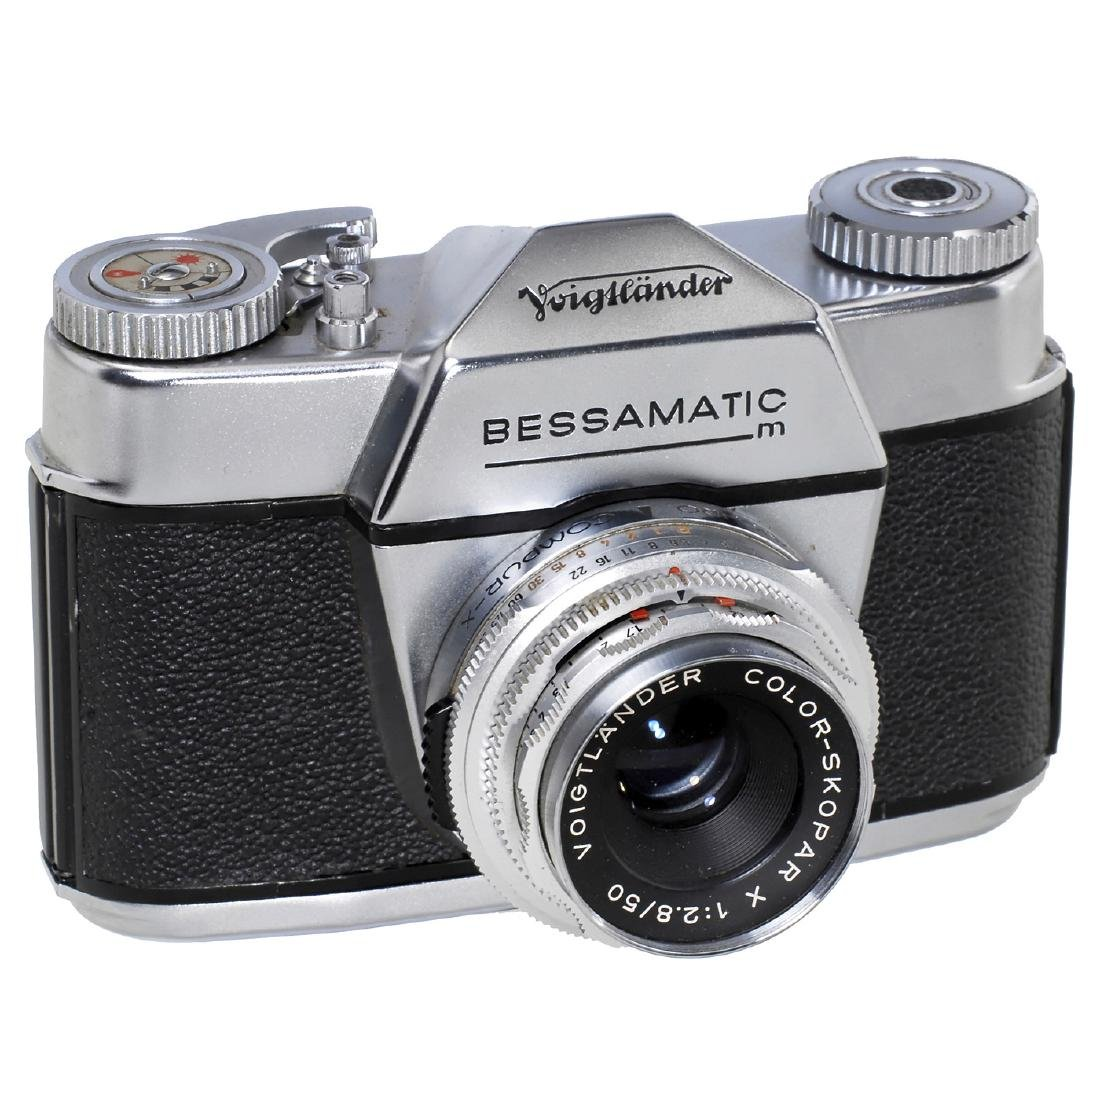 Bessamatic_m, 1964